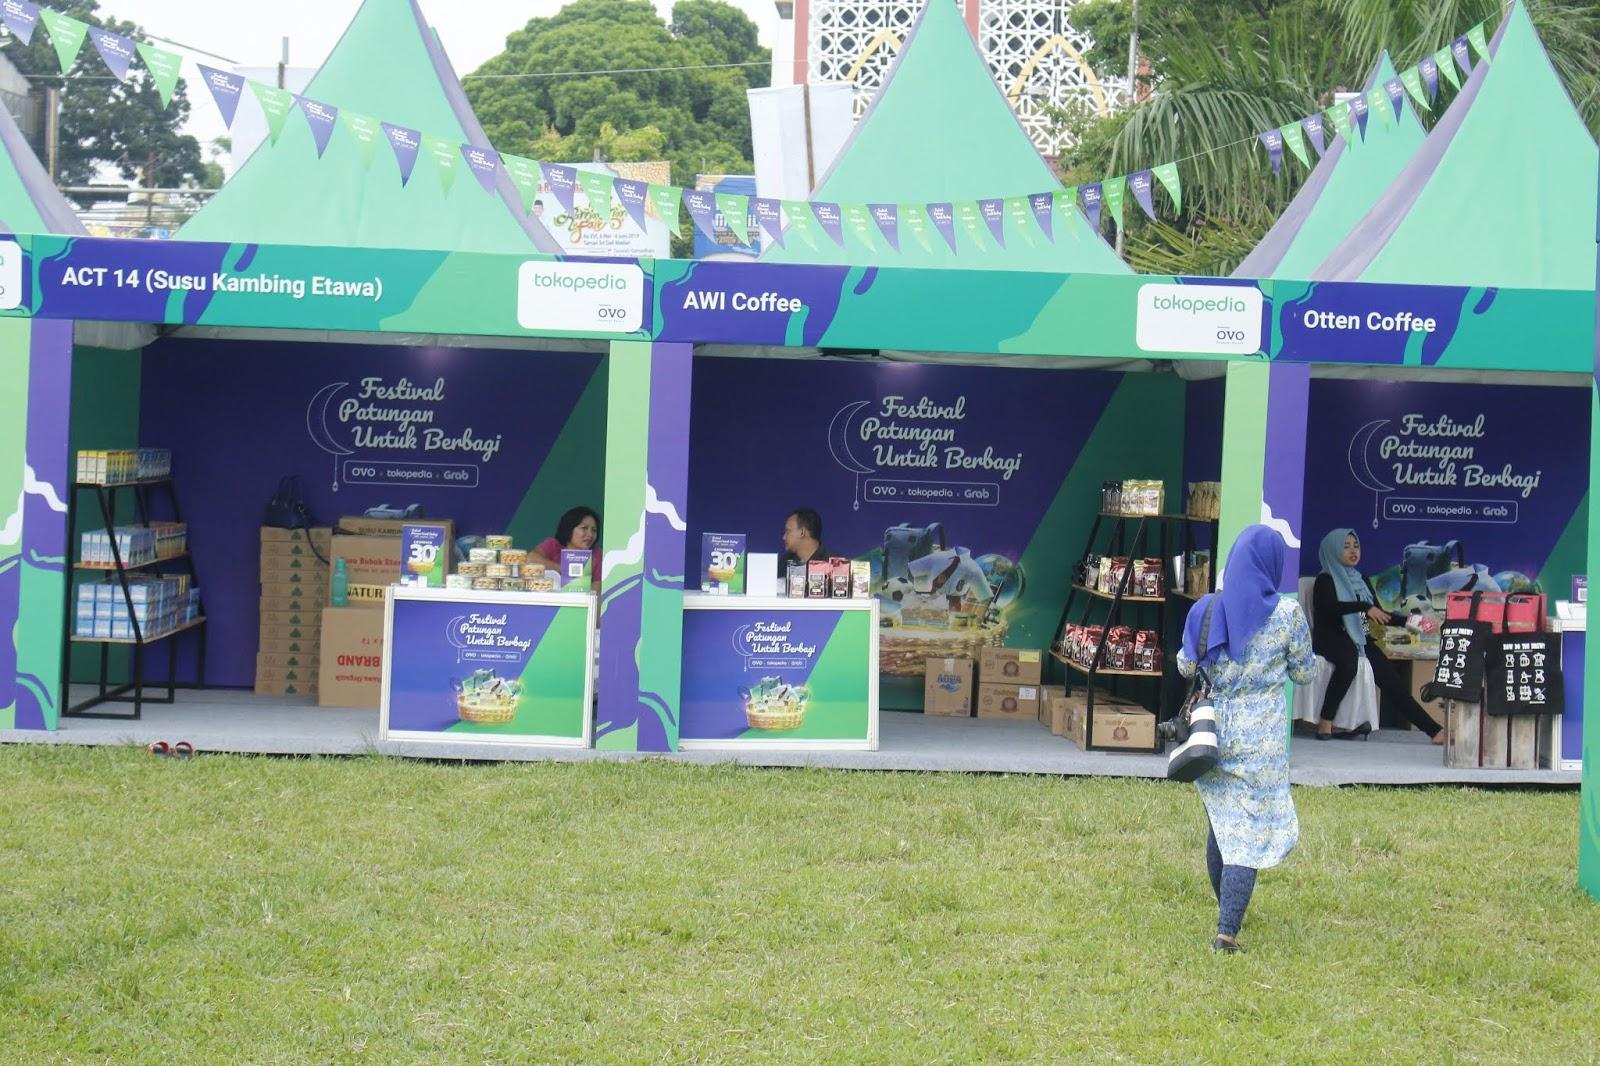 festival patungan untuk berbagi di kota medan